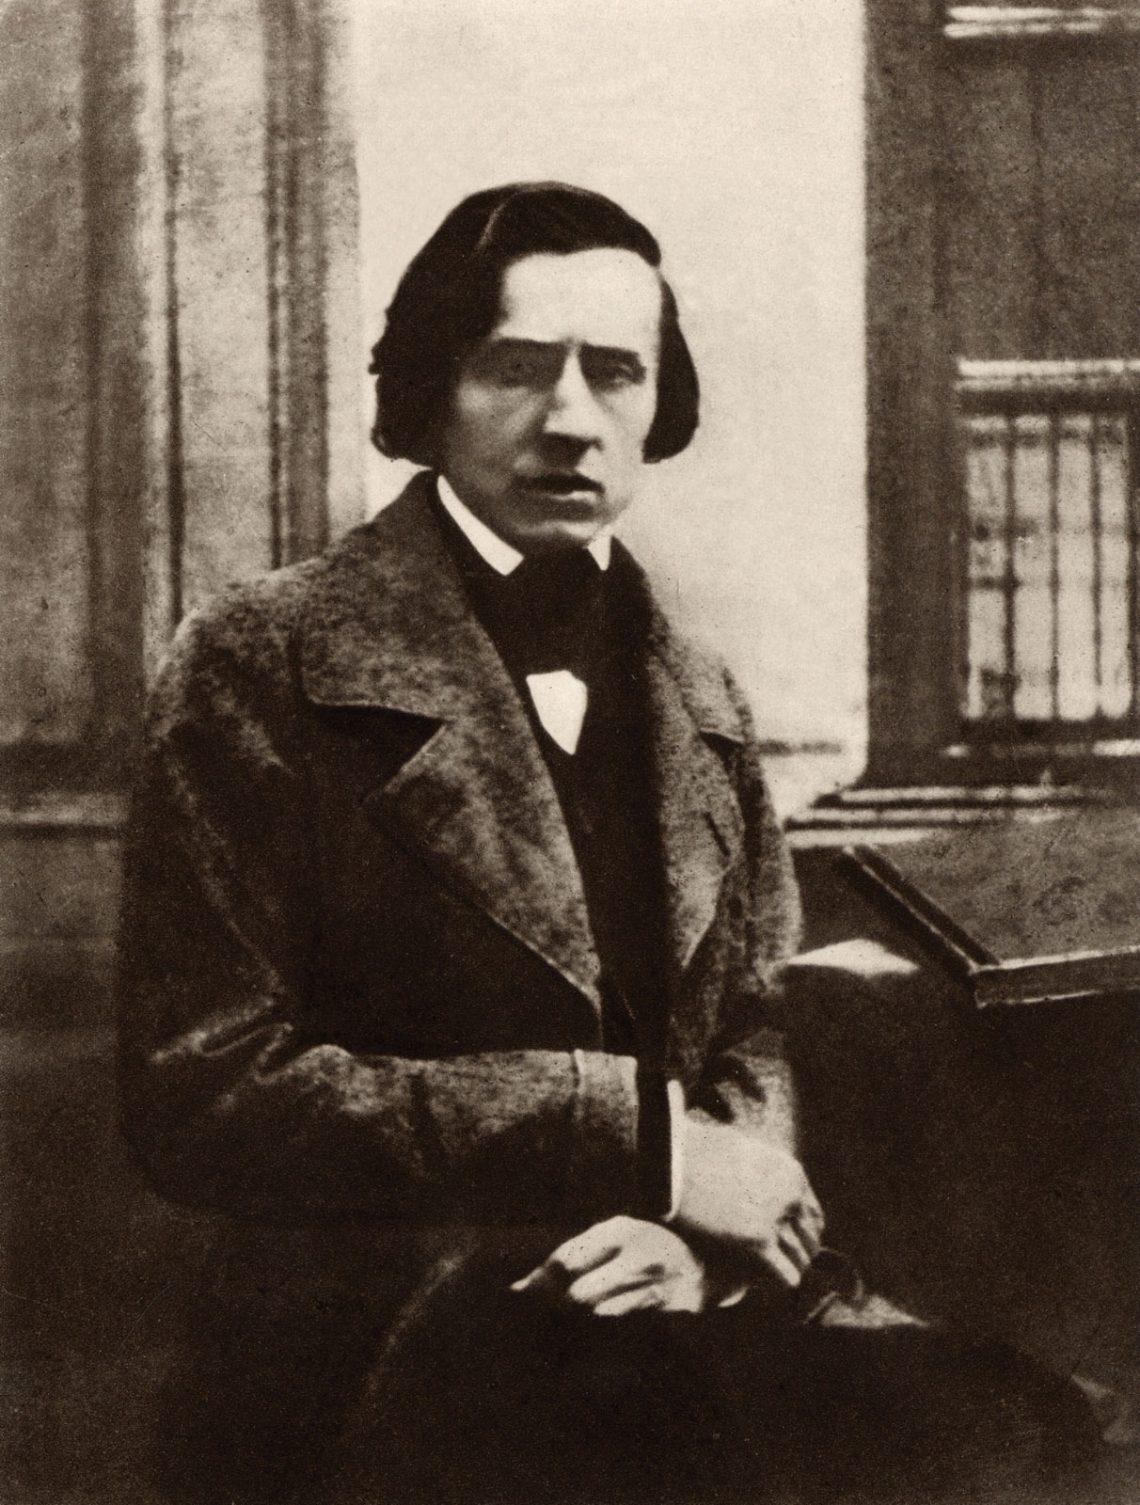 Фредерик Шопен. Фото Луи-Огюста Бисссона, 1849 год.